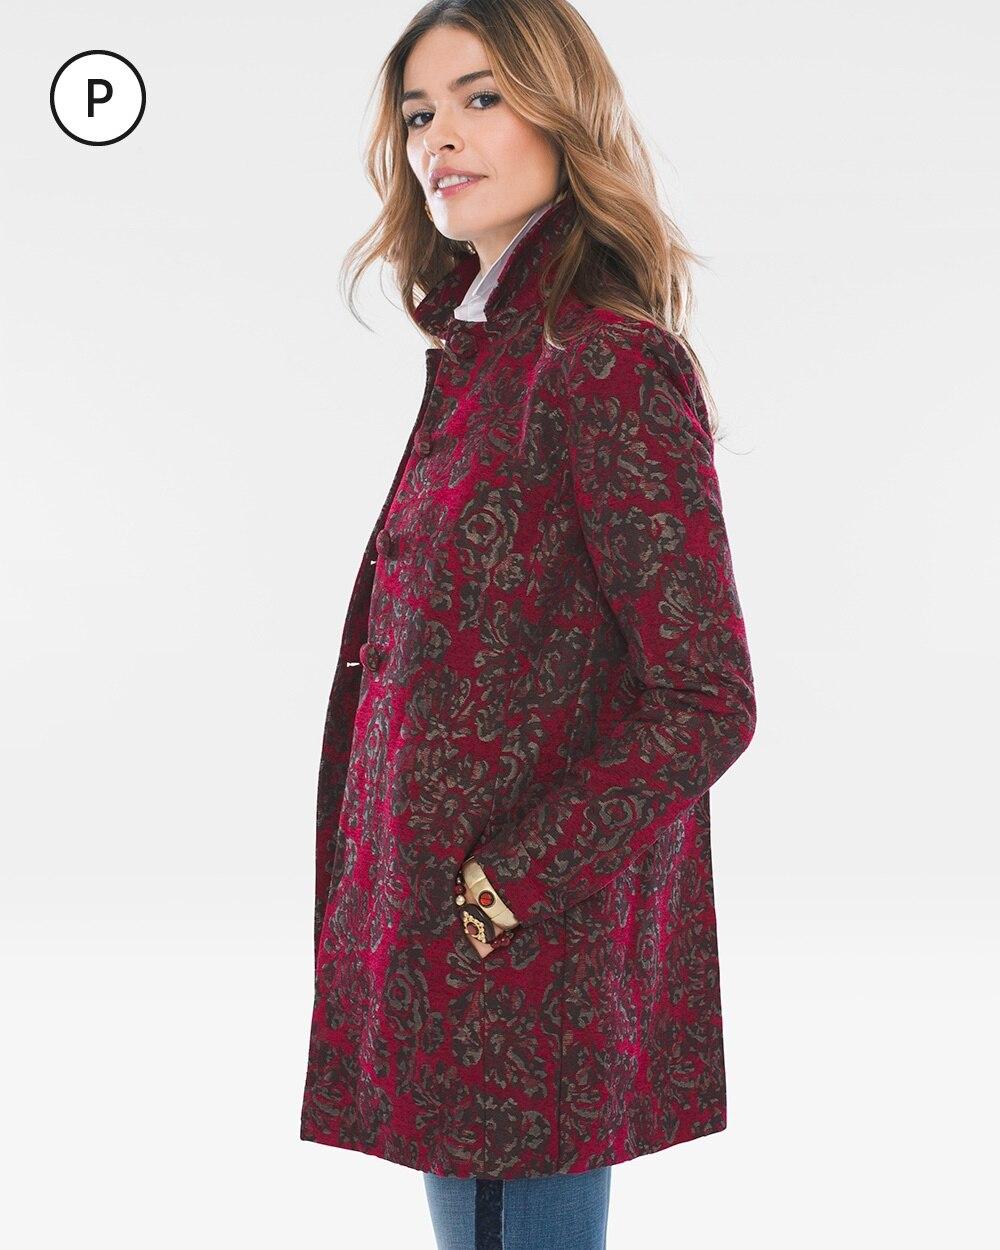 Petite Floral Jacquard Jacket